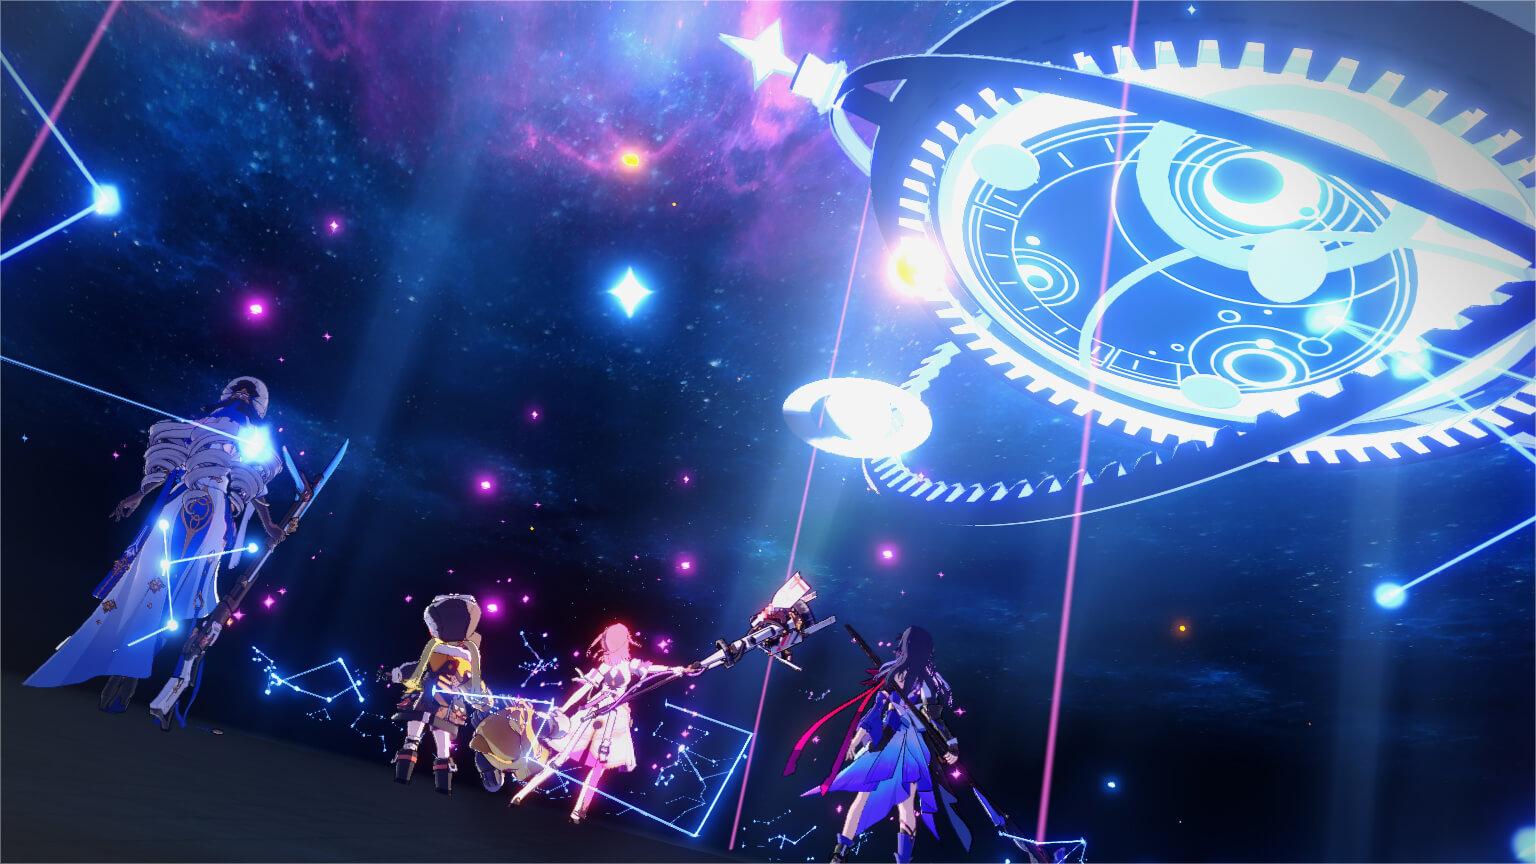 Aperçu de l'univers de Honkai: Star Rail